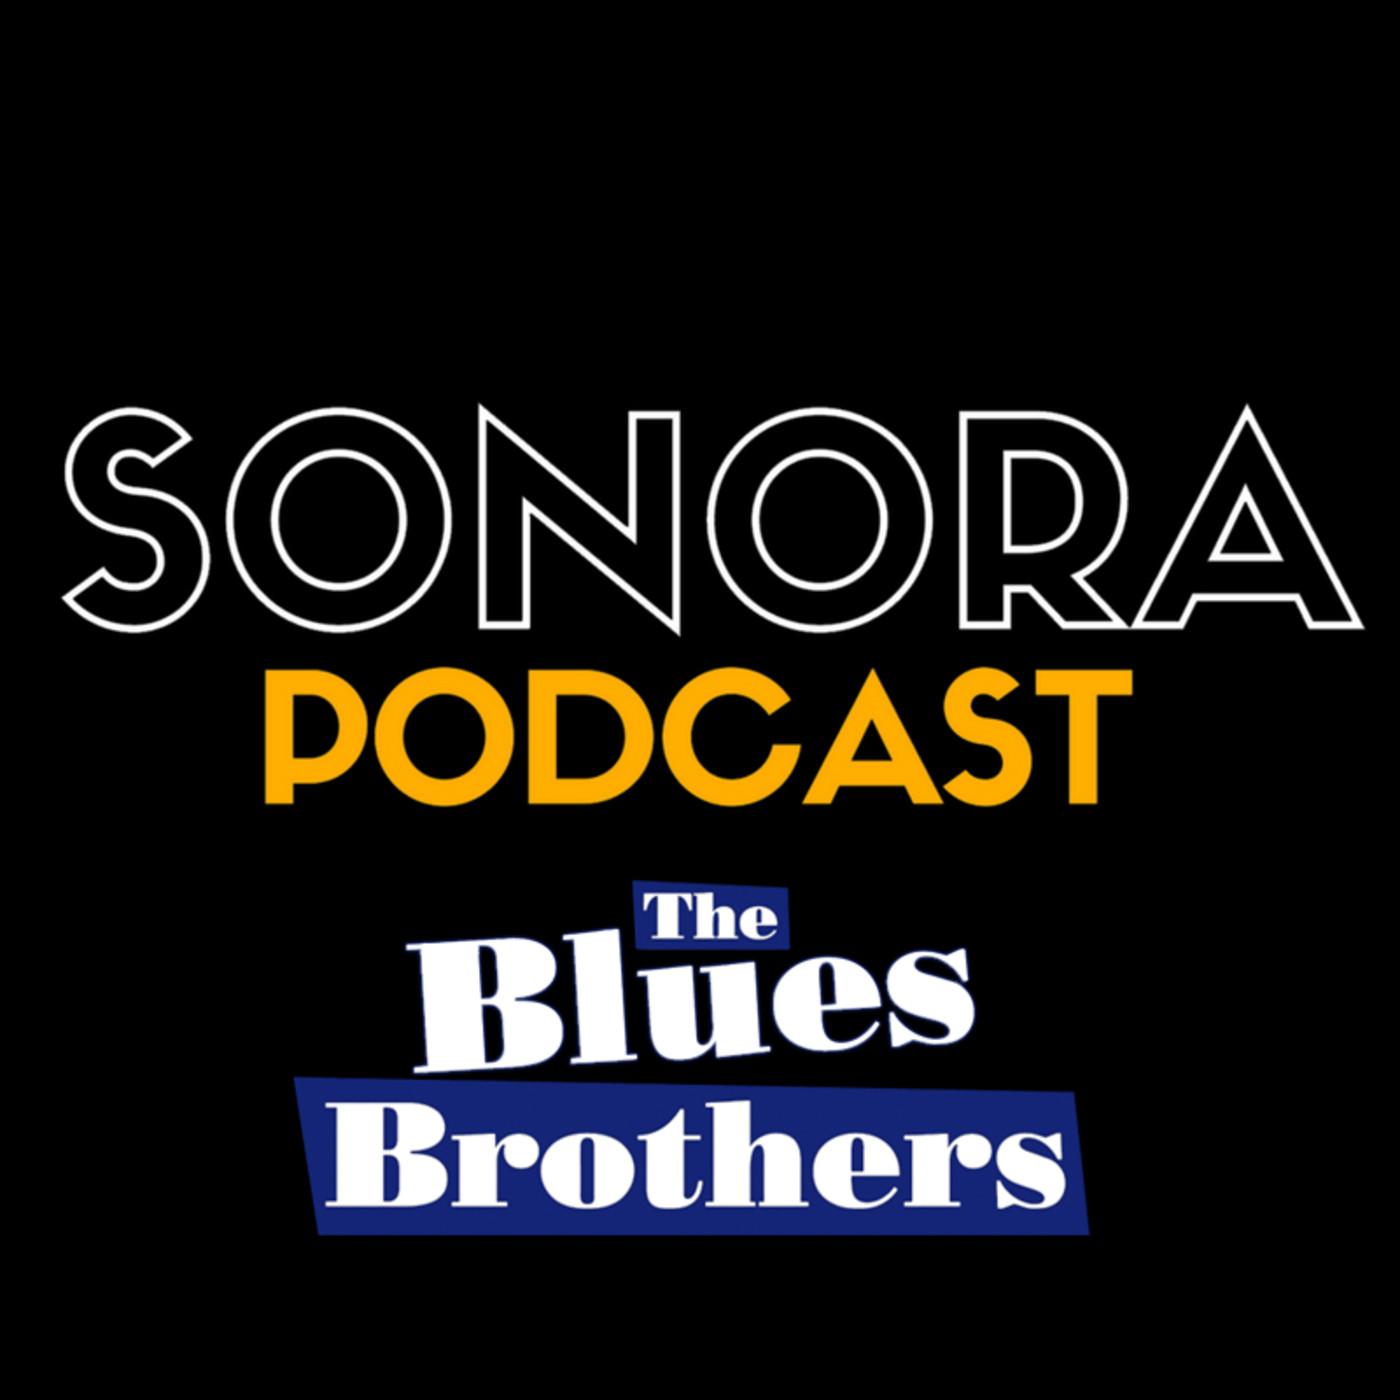 SONORA PODCAST Capítulo Veintiocho - Los Blues Brothers